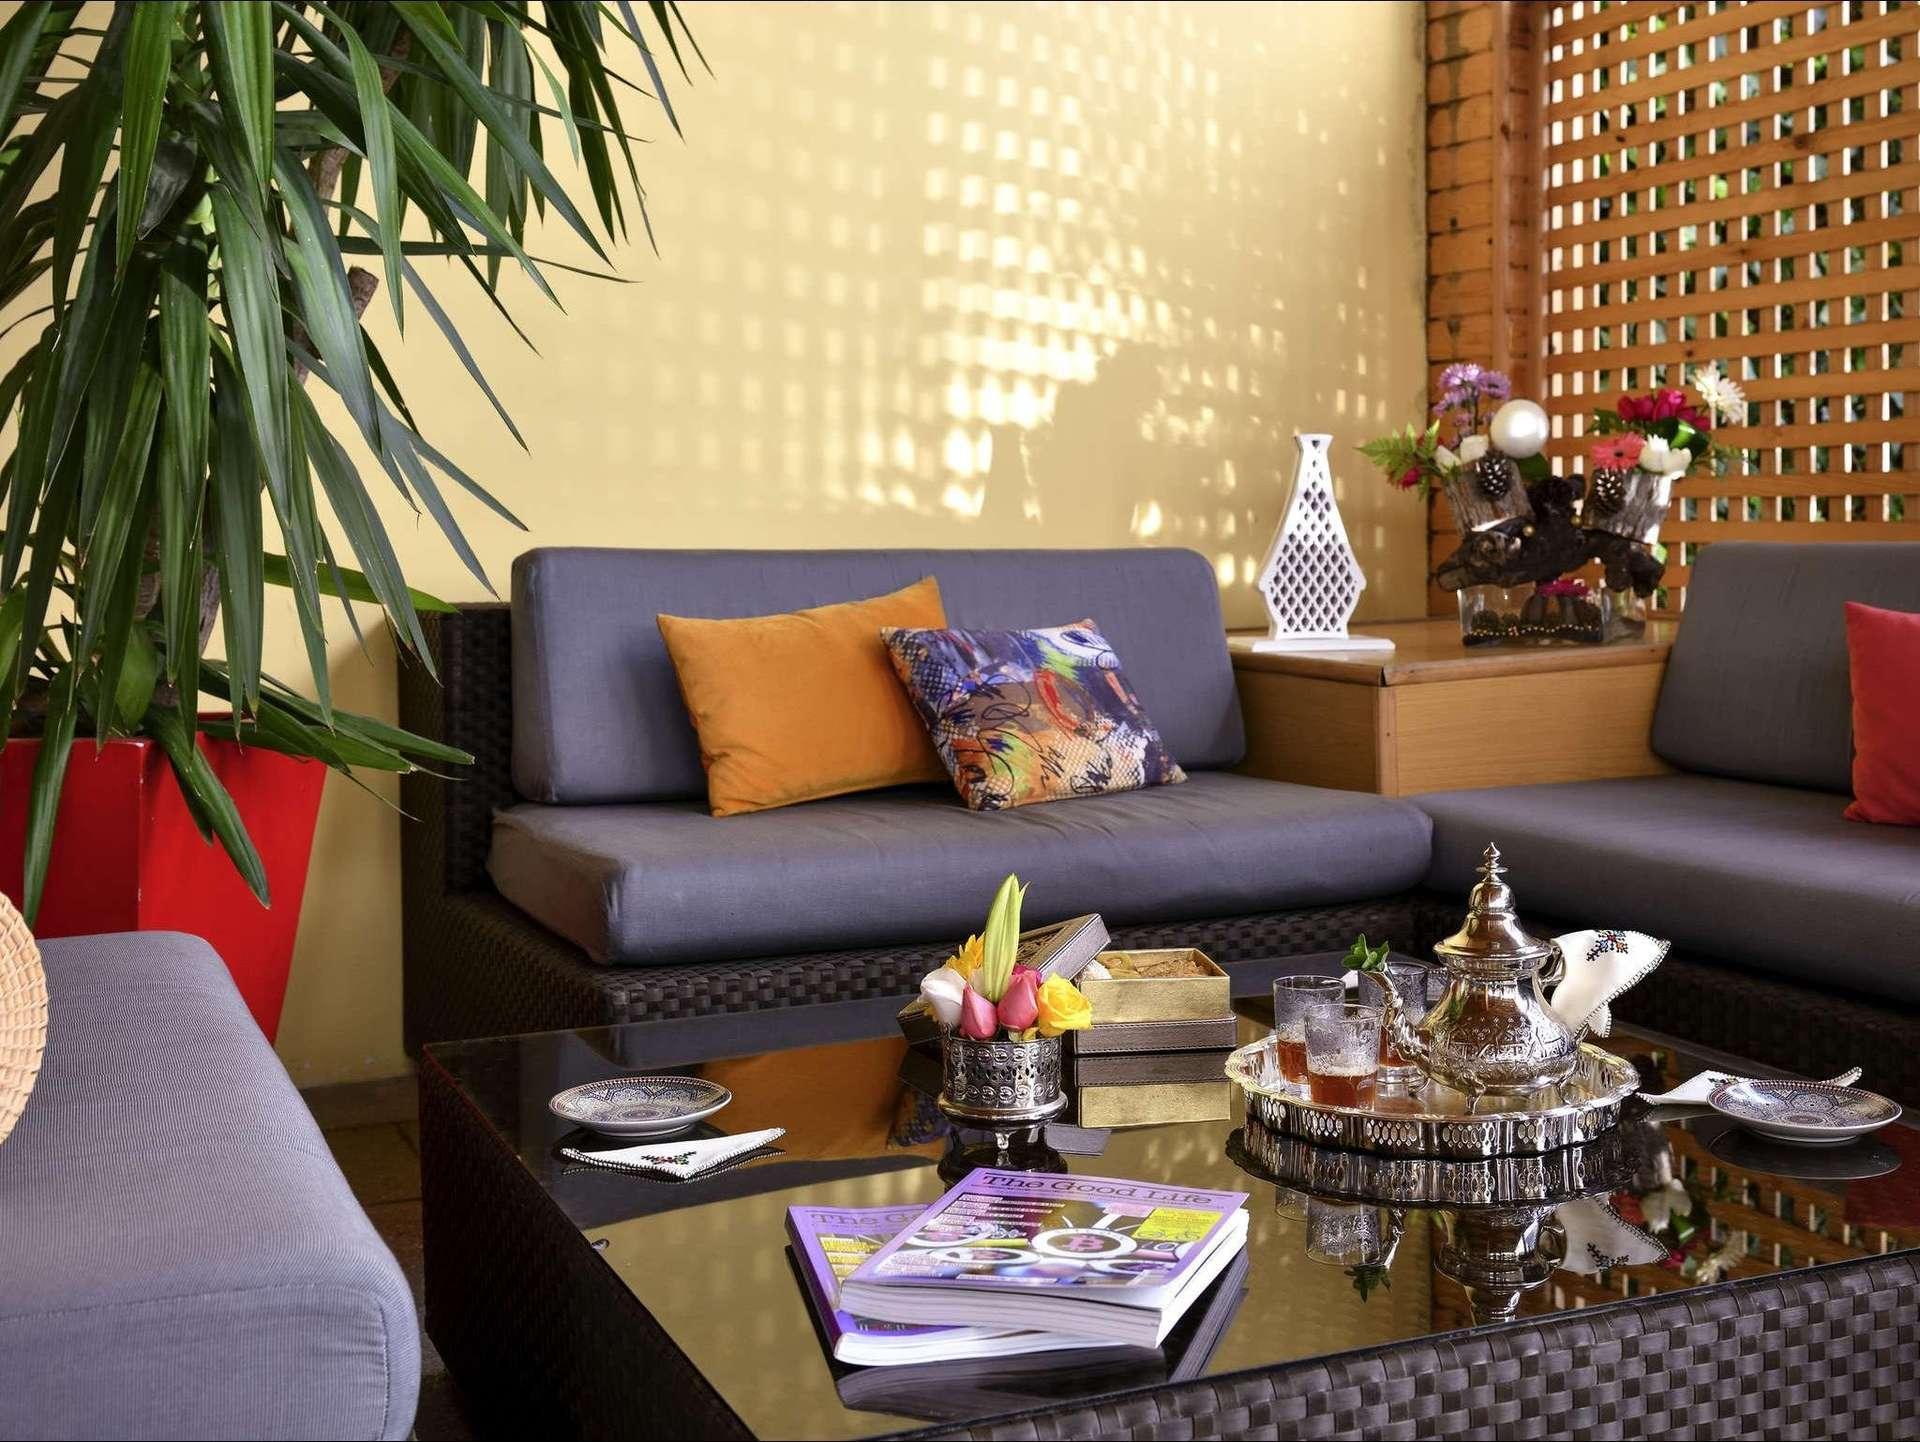 Hotel Mercure Sheherazade lobby - Rabat